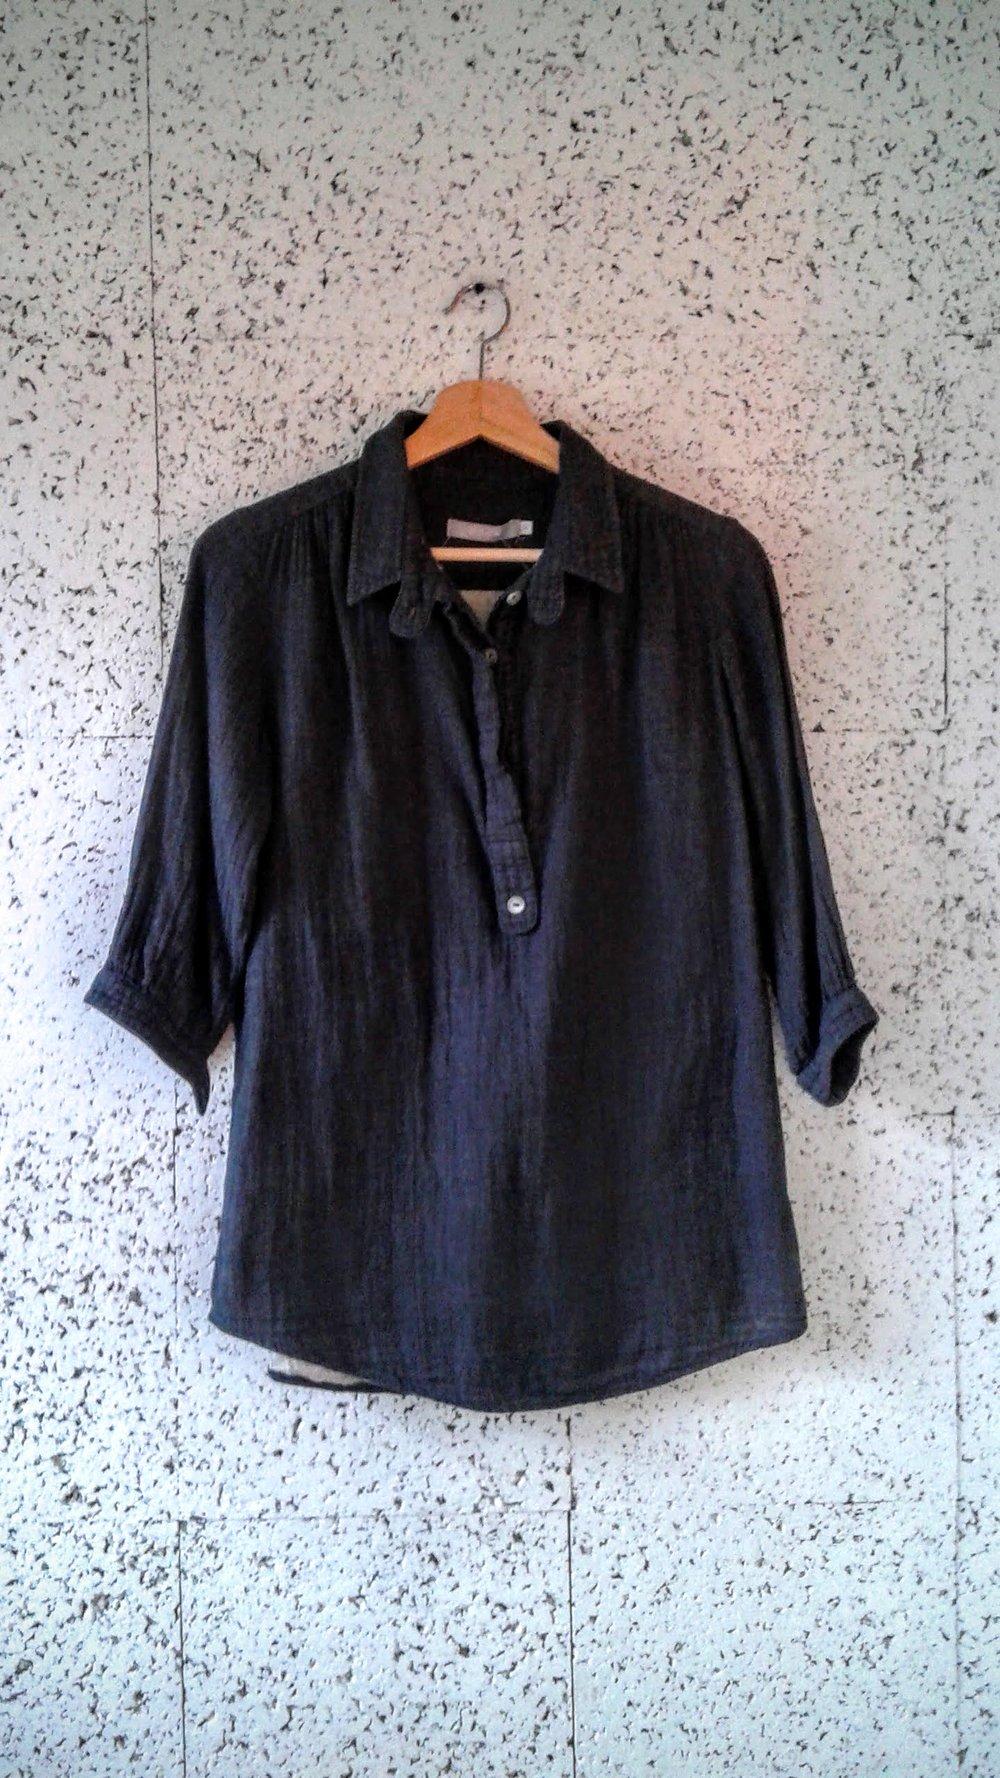 Dace shirt; Size S, $28